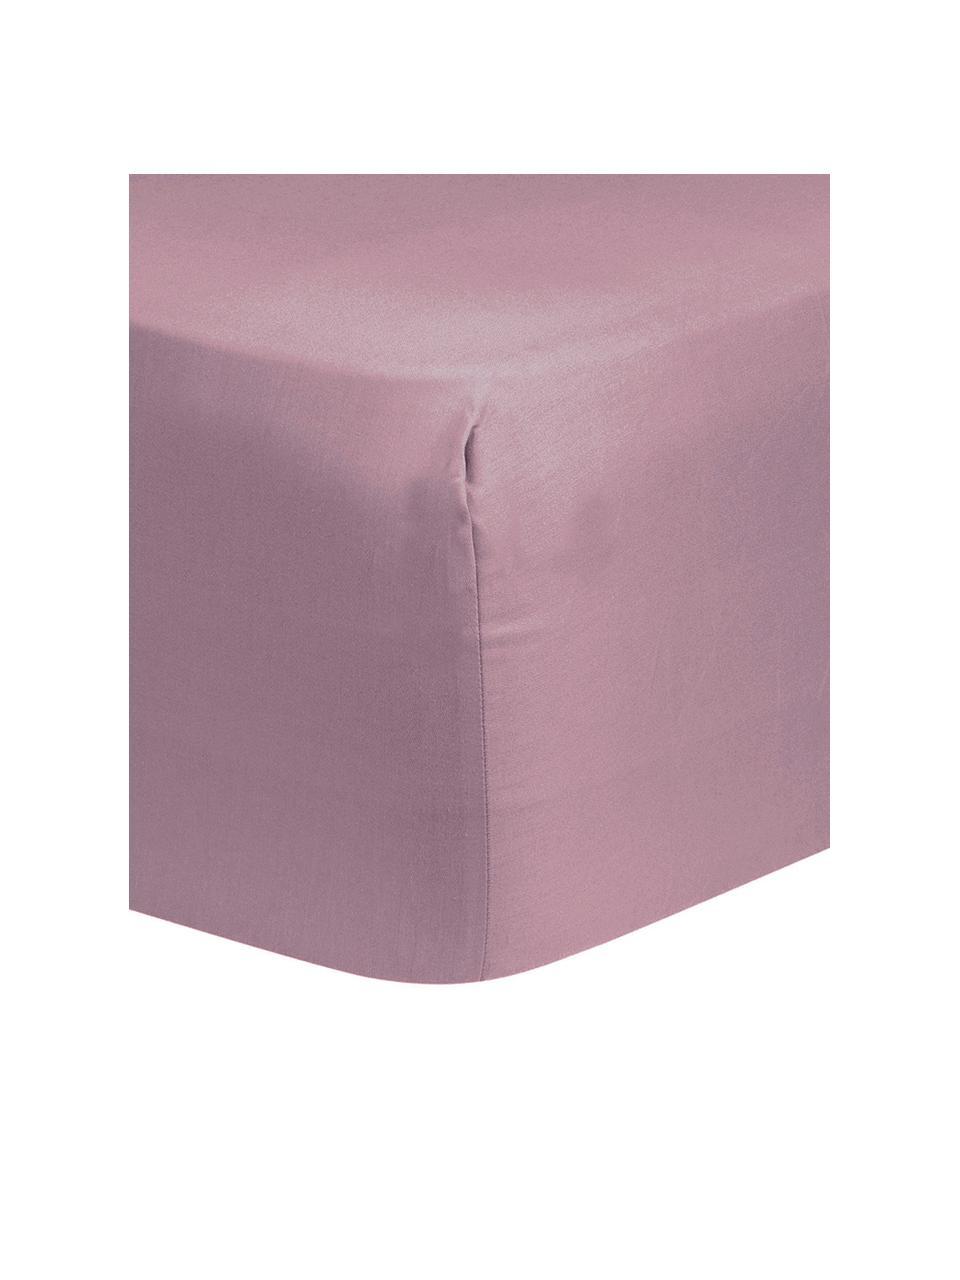 Sábana bajera de satén Comfort, Malva, Cama 180 cm (180 x 200 cm)